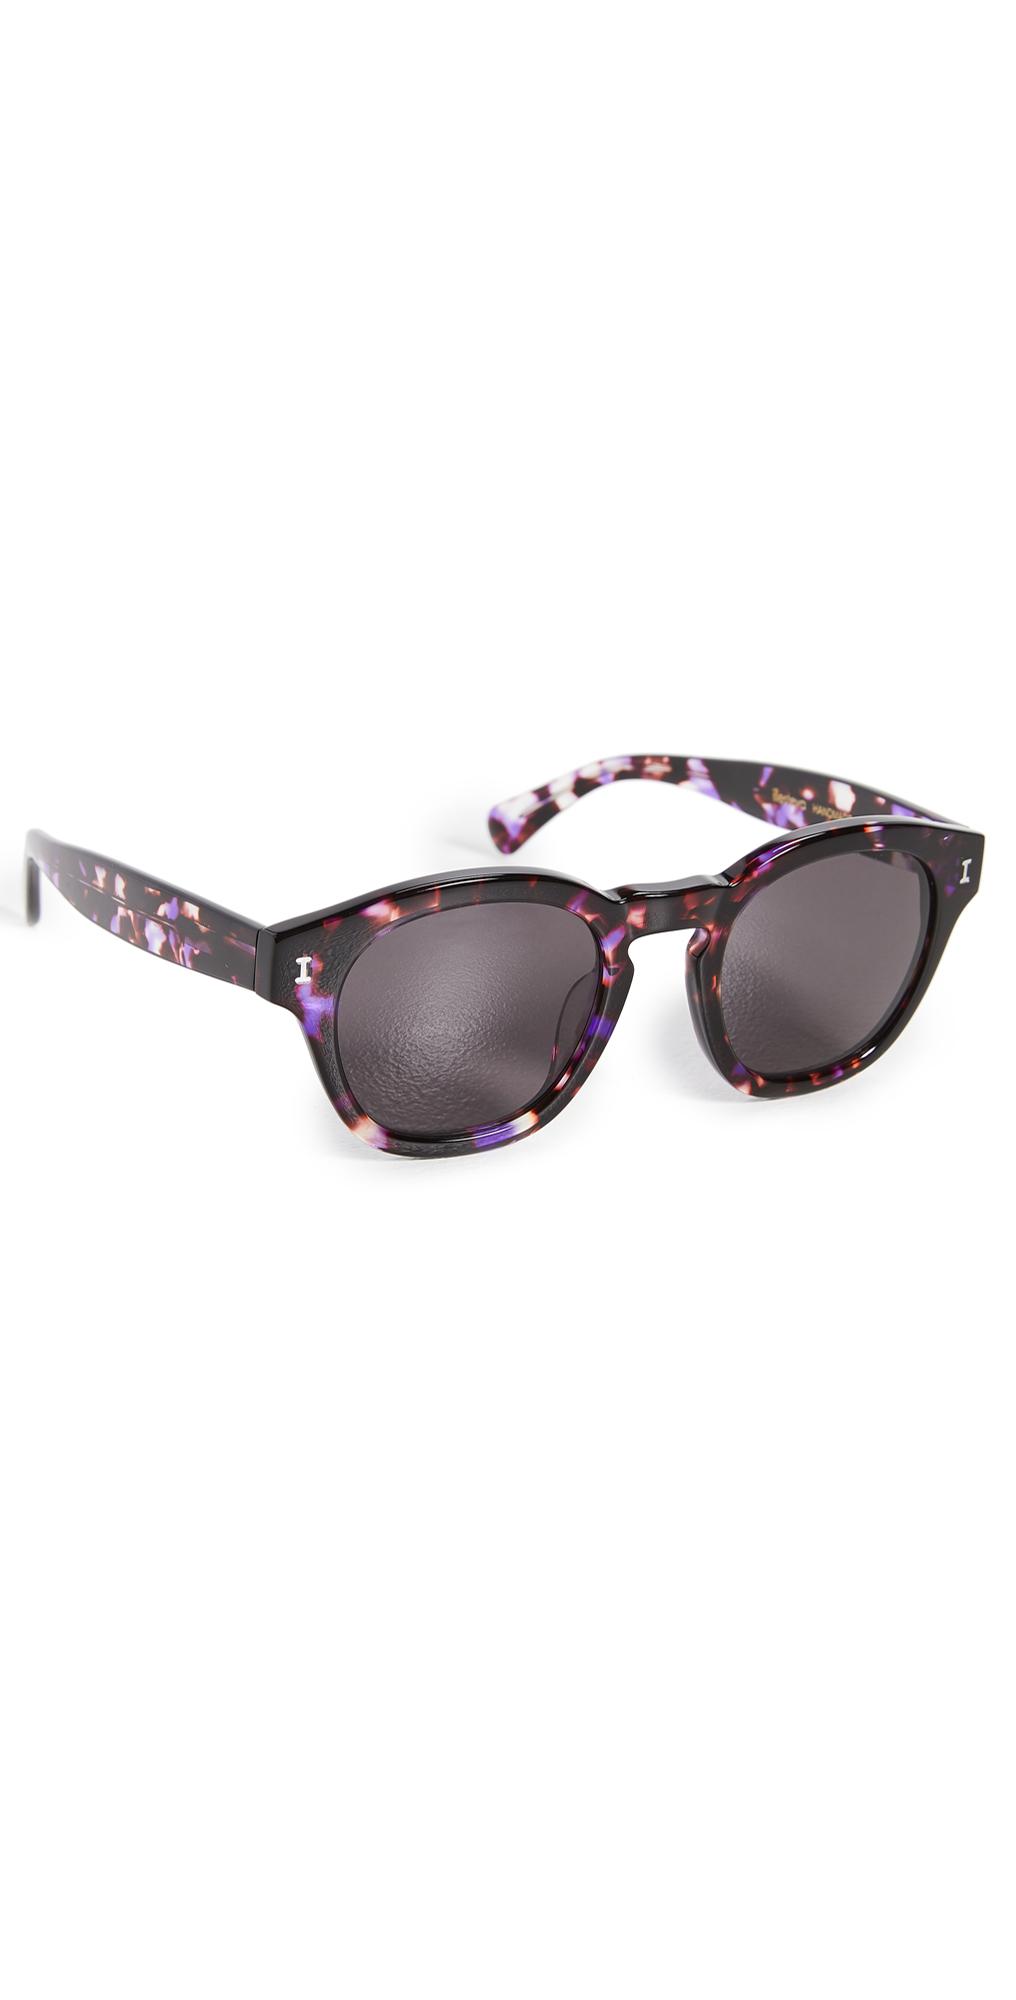 Madison Berry Tortoise Sunglasses